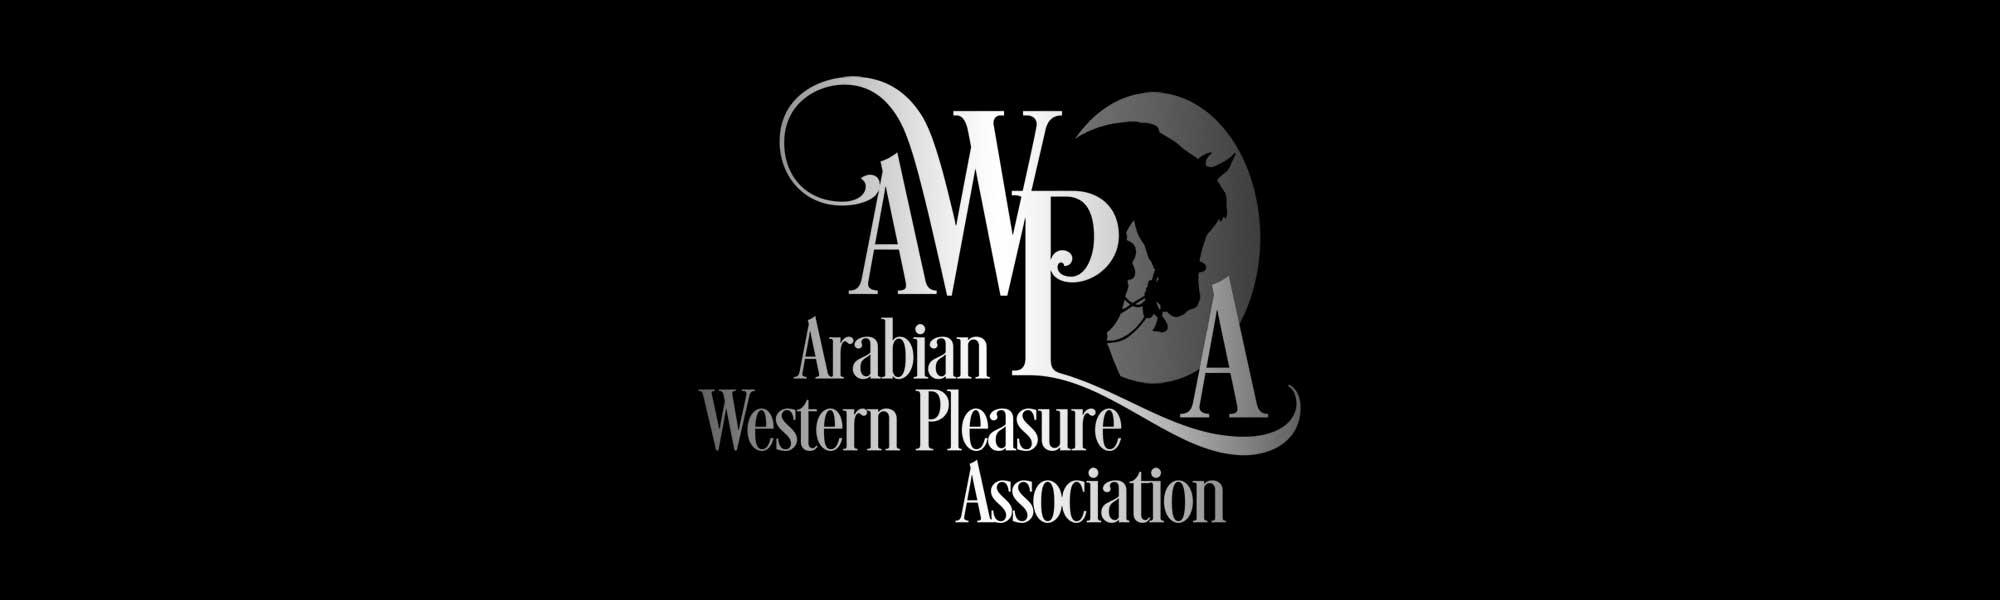 AHW & AWPA Together Again